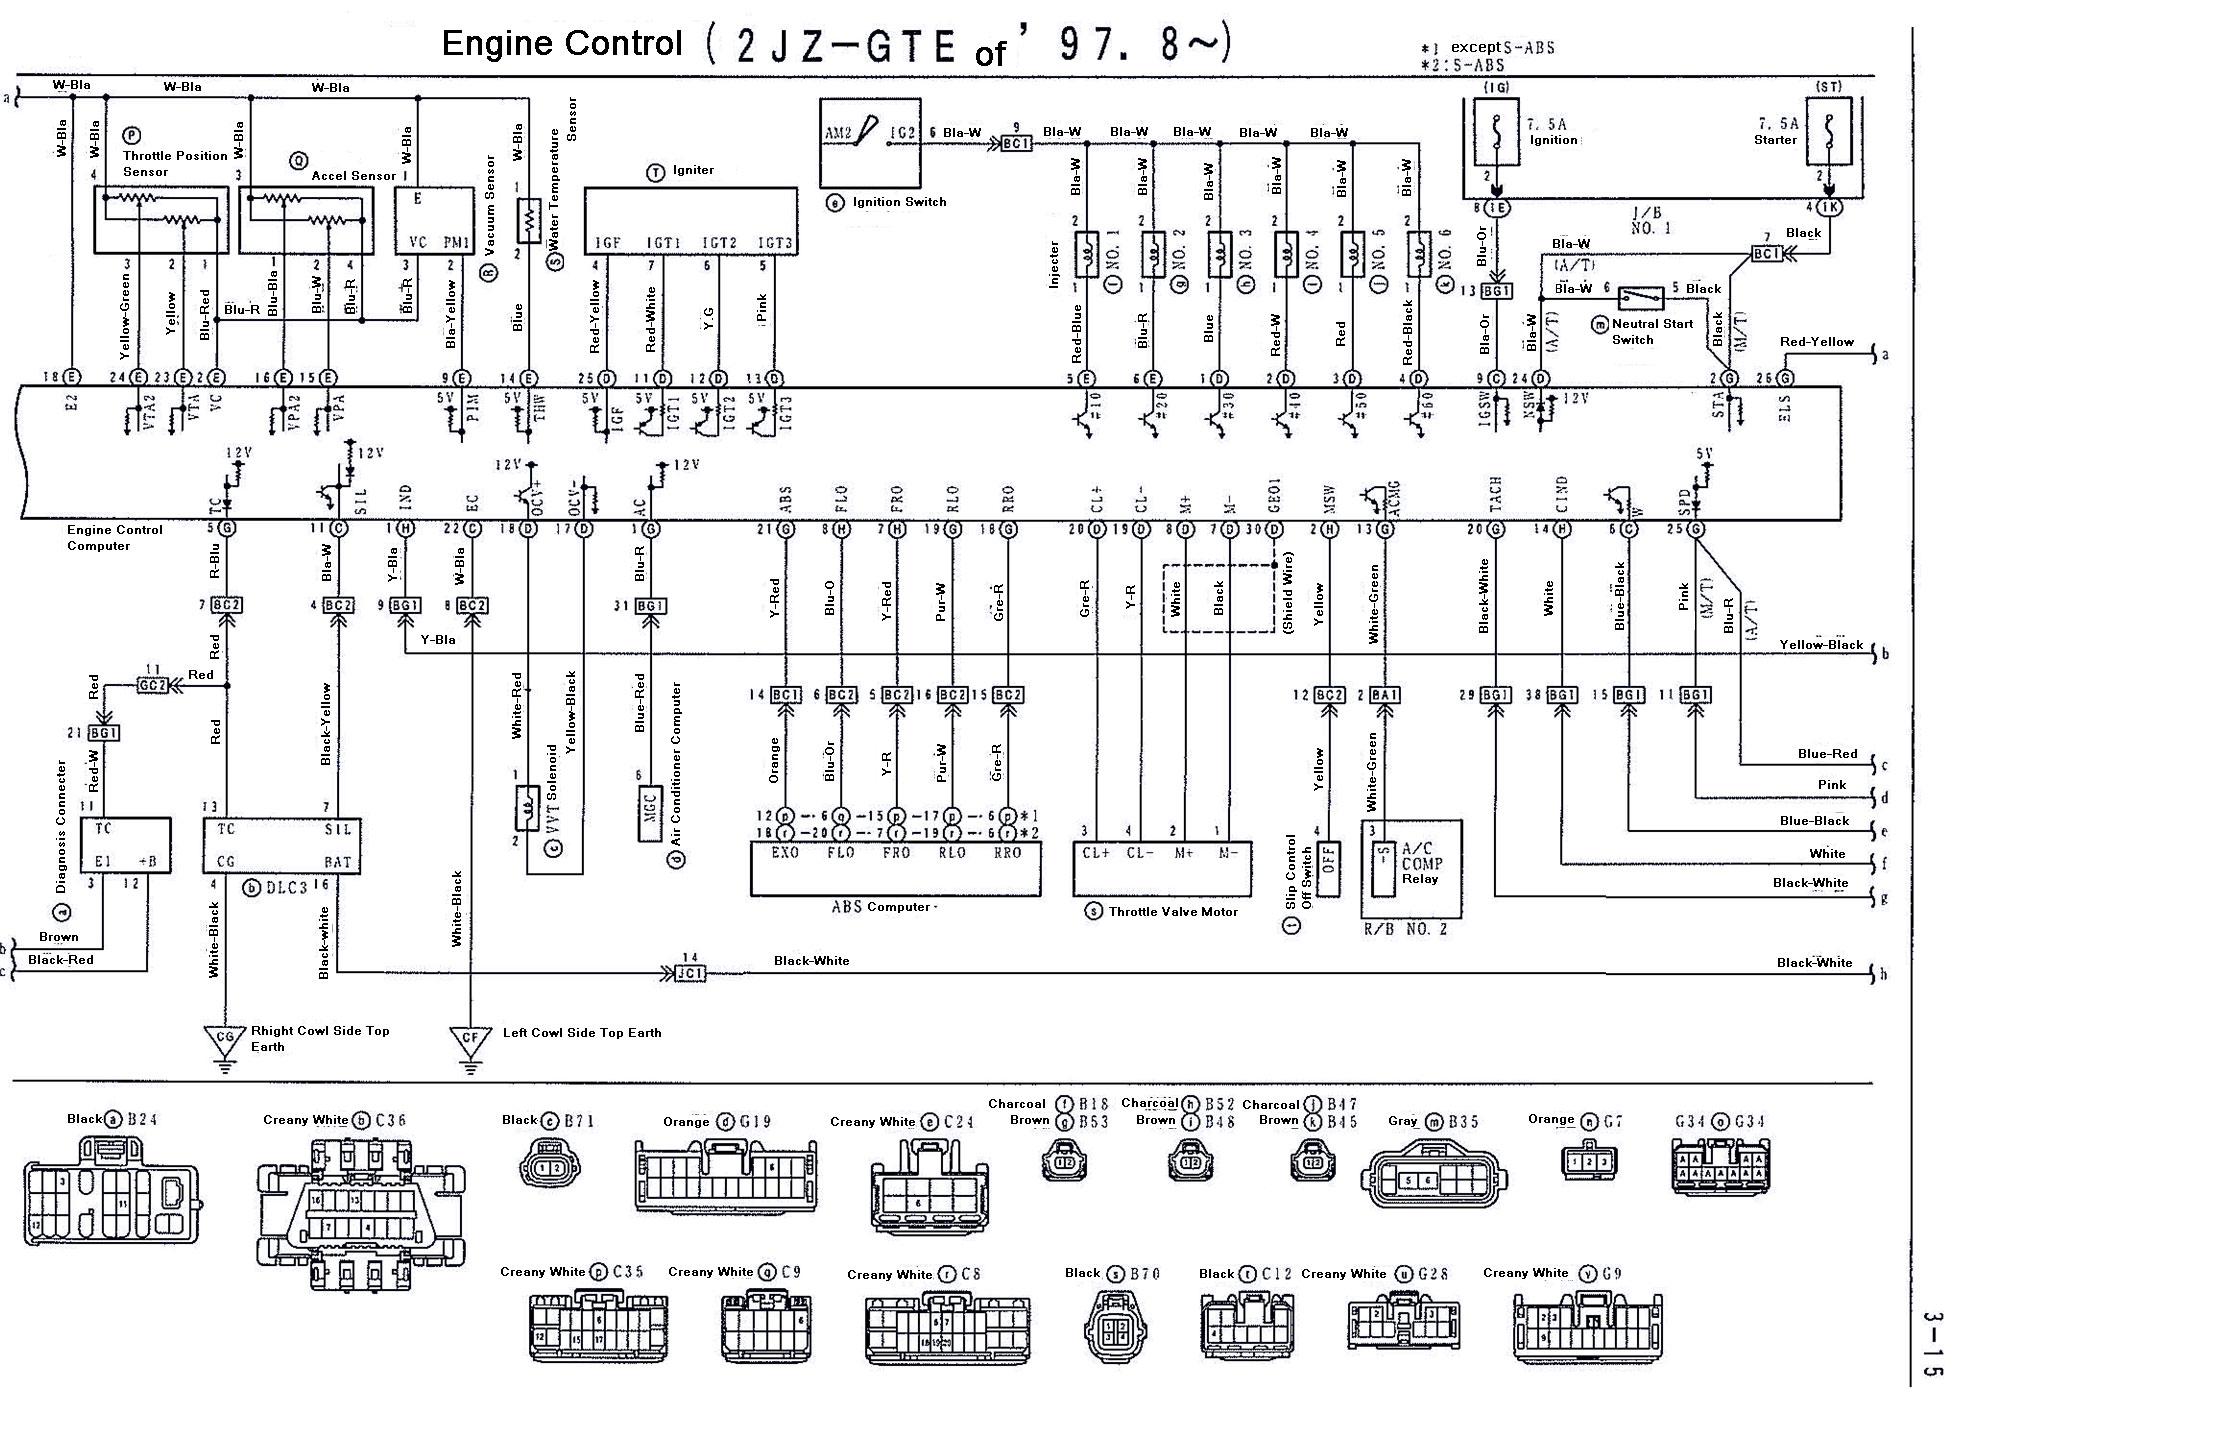 1994 Supra Wiring Diagram Honeywell Oil Burner Primary Control Wiring Diagram Stereoa Pujaan Hati Jeanjaures37 Fr